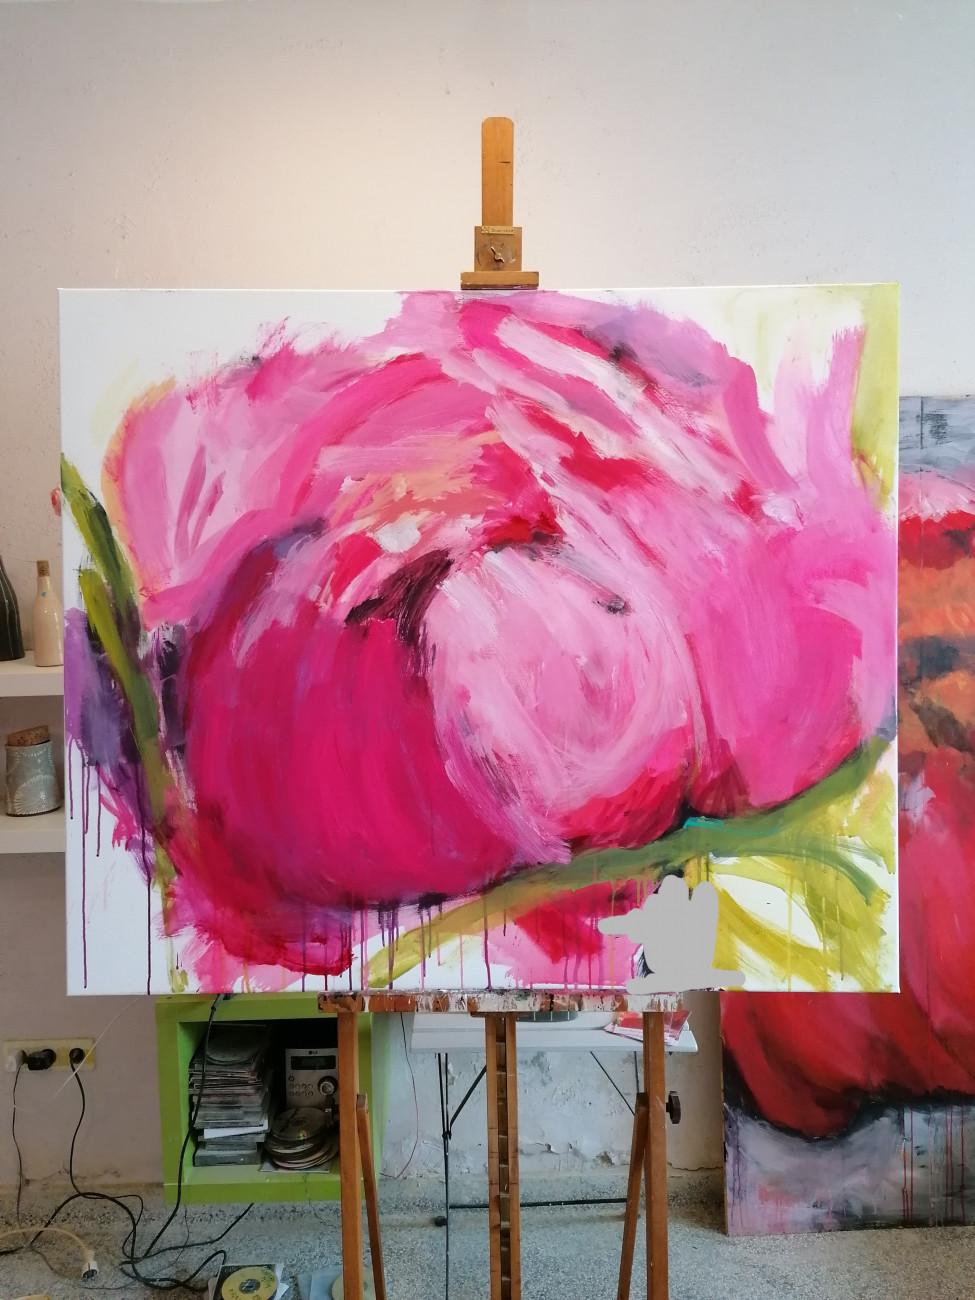 Uta Minnich, Acrylmalerei große Blumenbilder dav